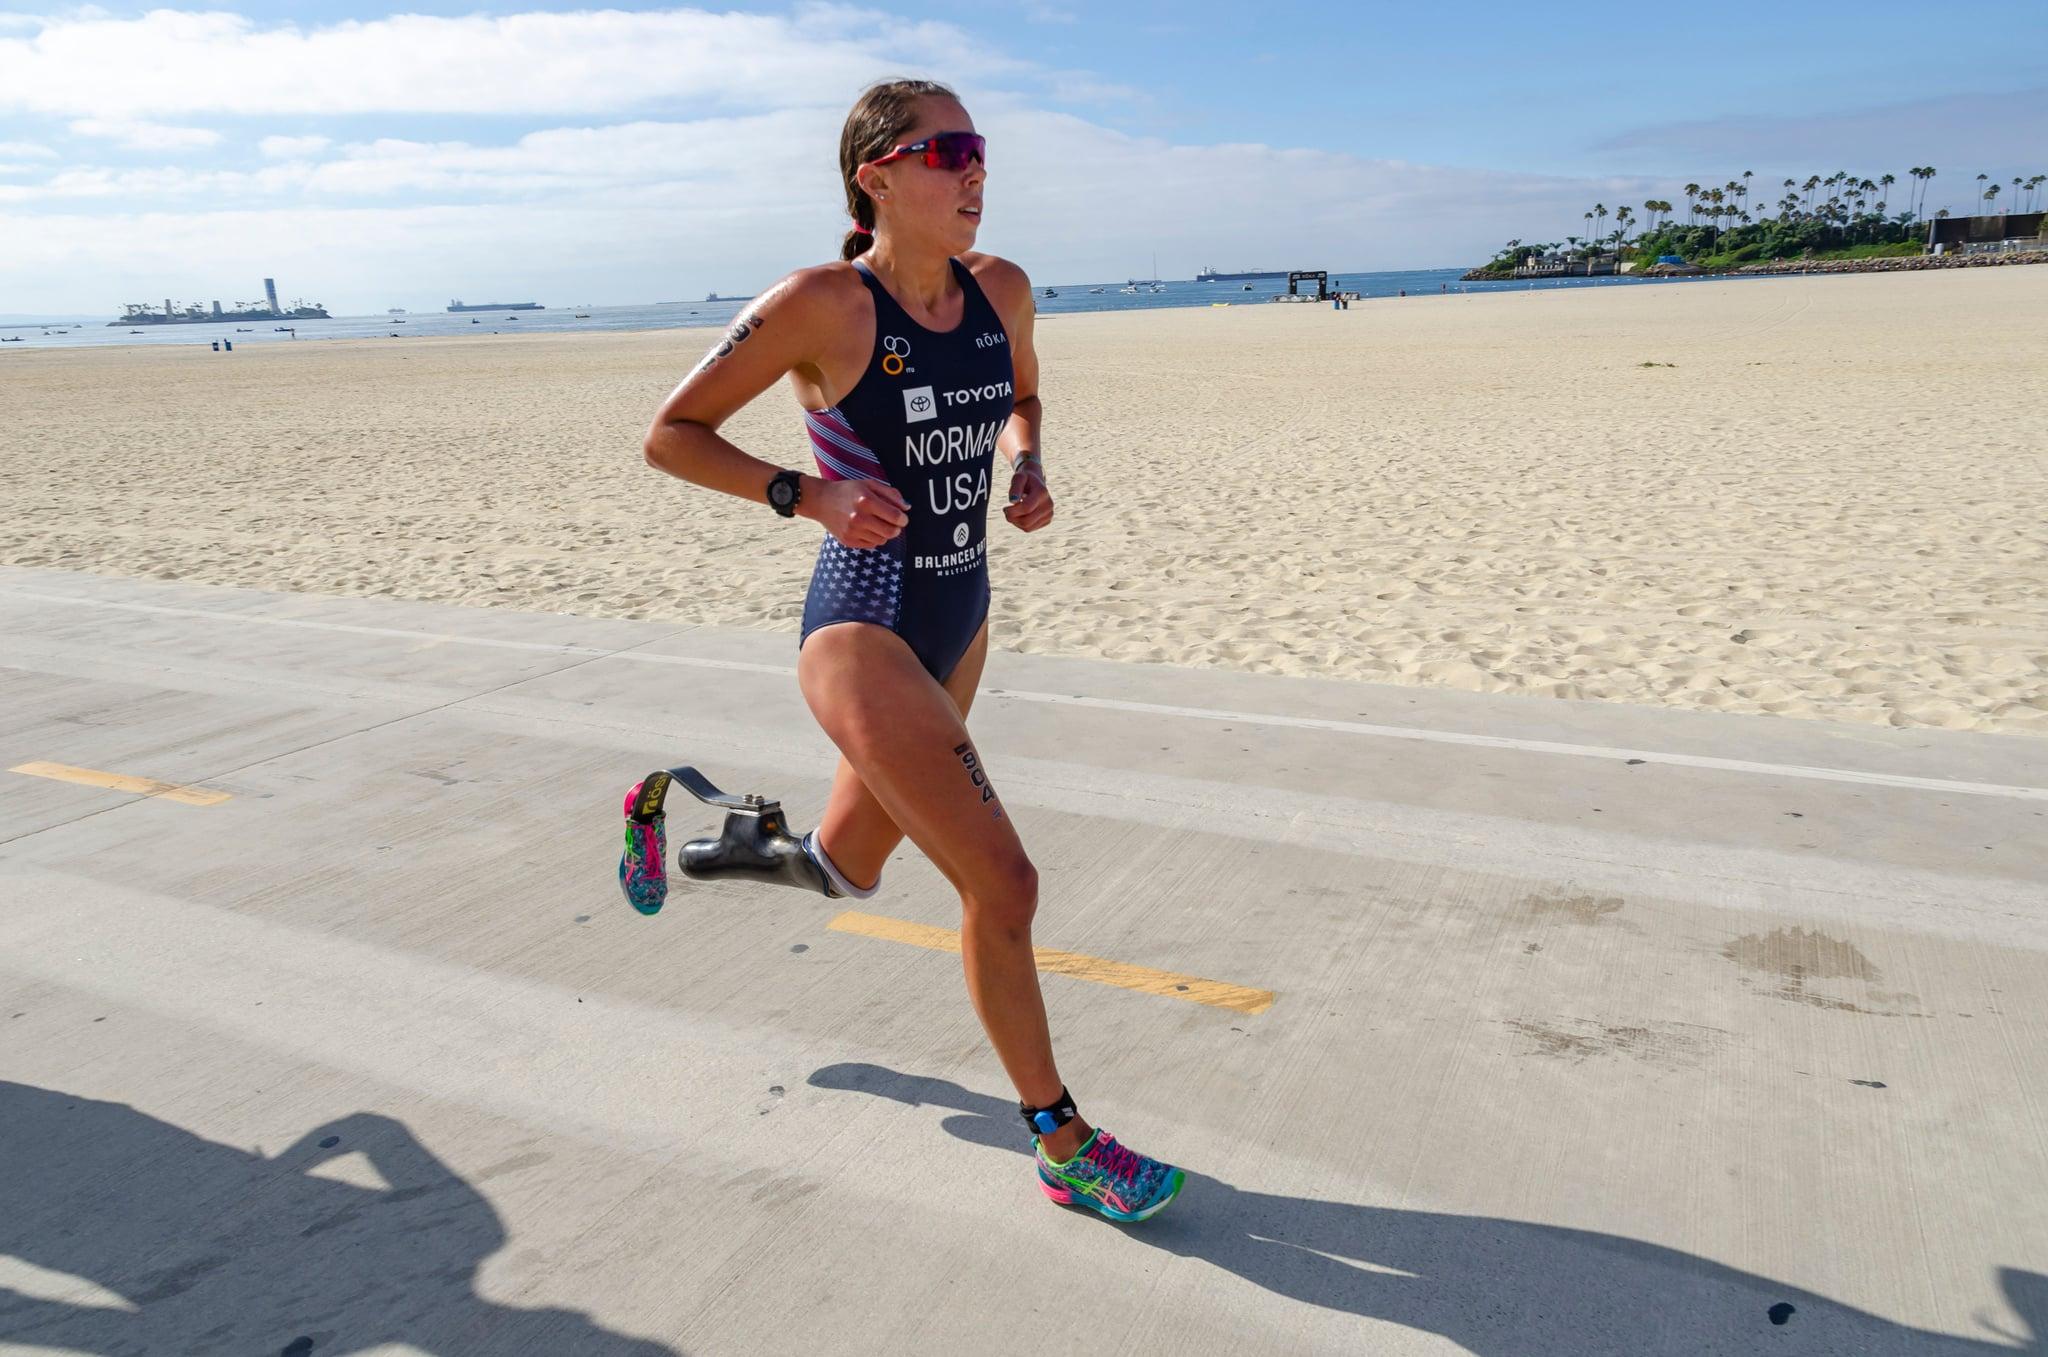 2019 USAT Paratriathlon National Championships in Long Beach, CA.  2019 Rich Cruse  CrusePhoto.com